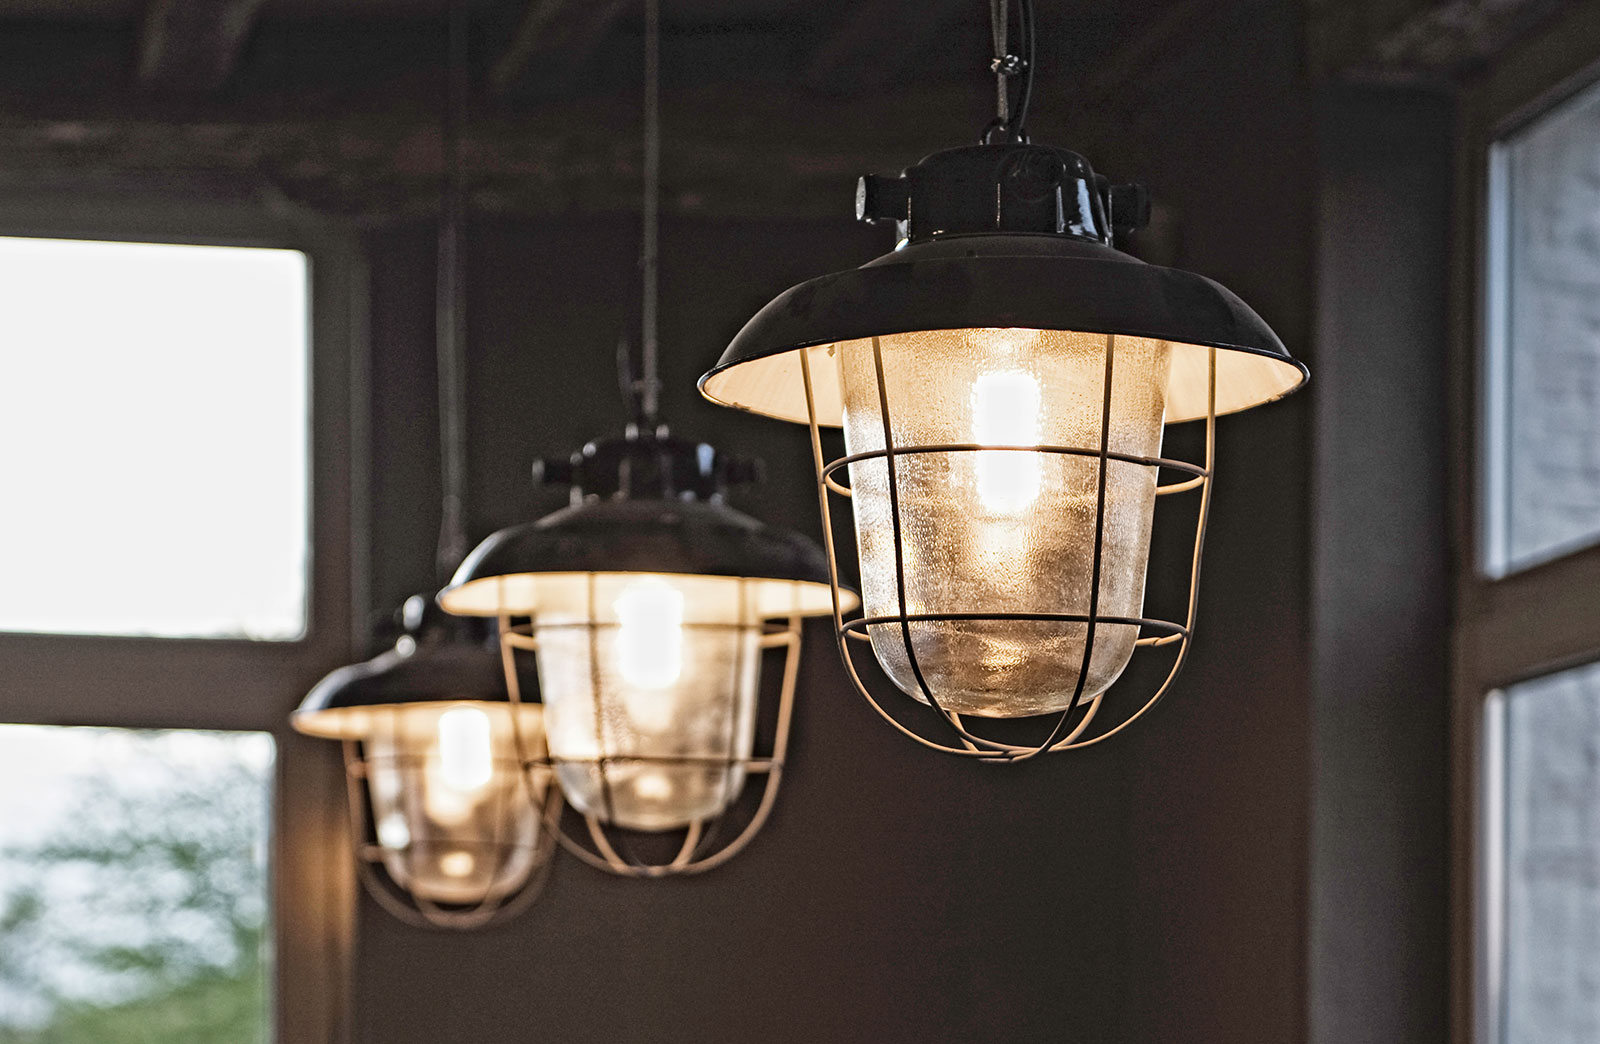 Industriele Hanglamp Keuken : Oude industri?le hanglampen – Woontheater